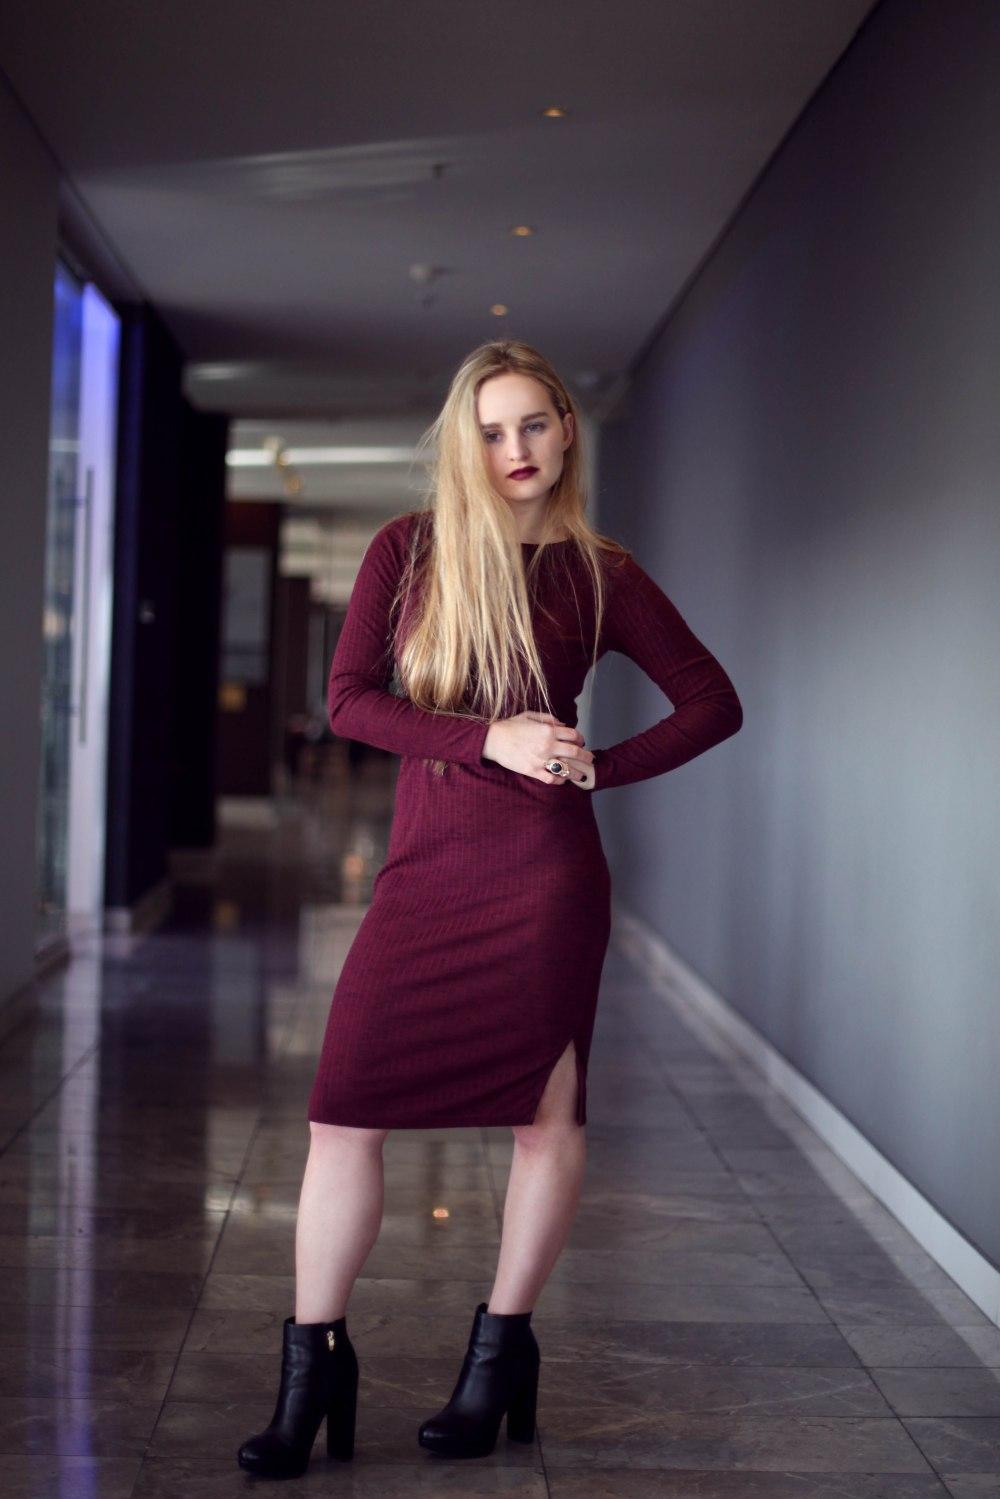 Trashcan Rebellion Red Wine Dress